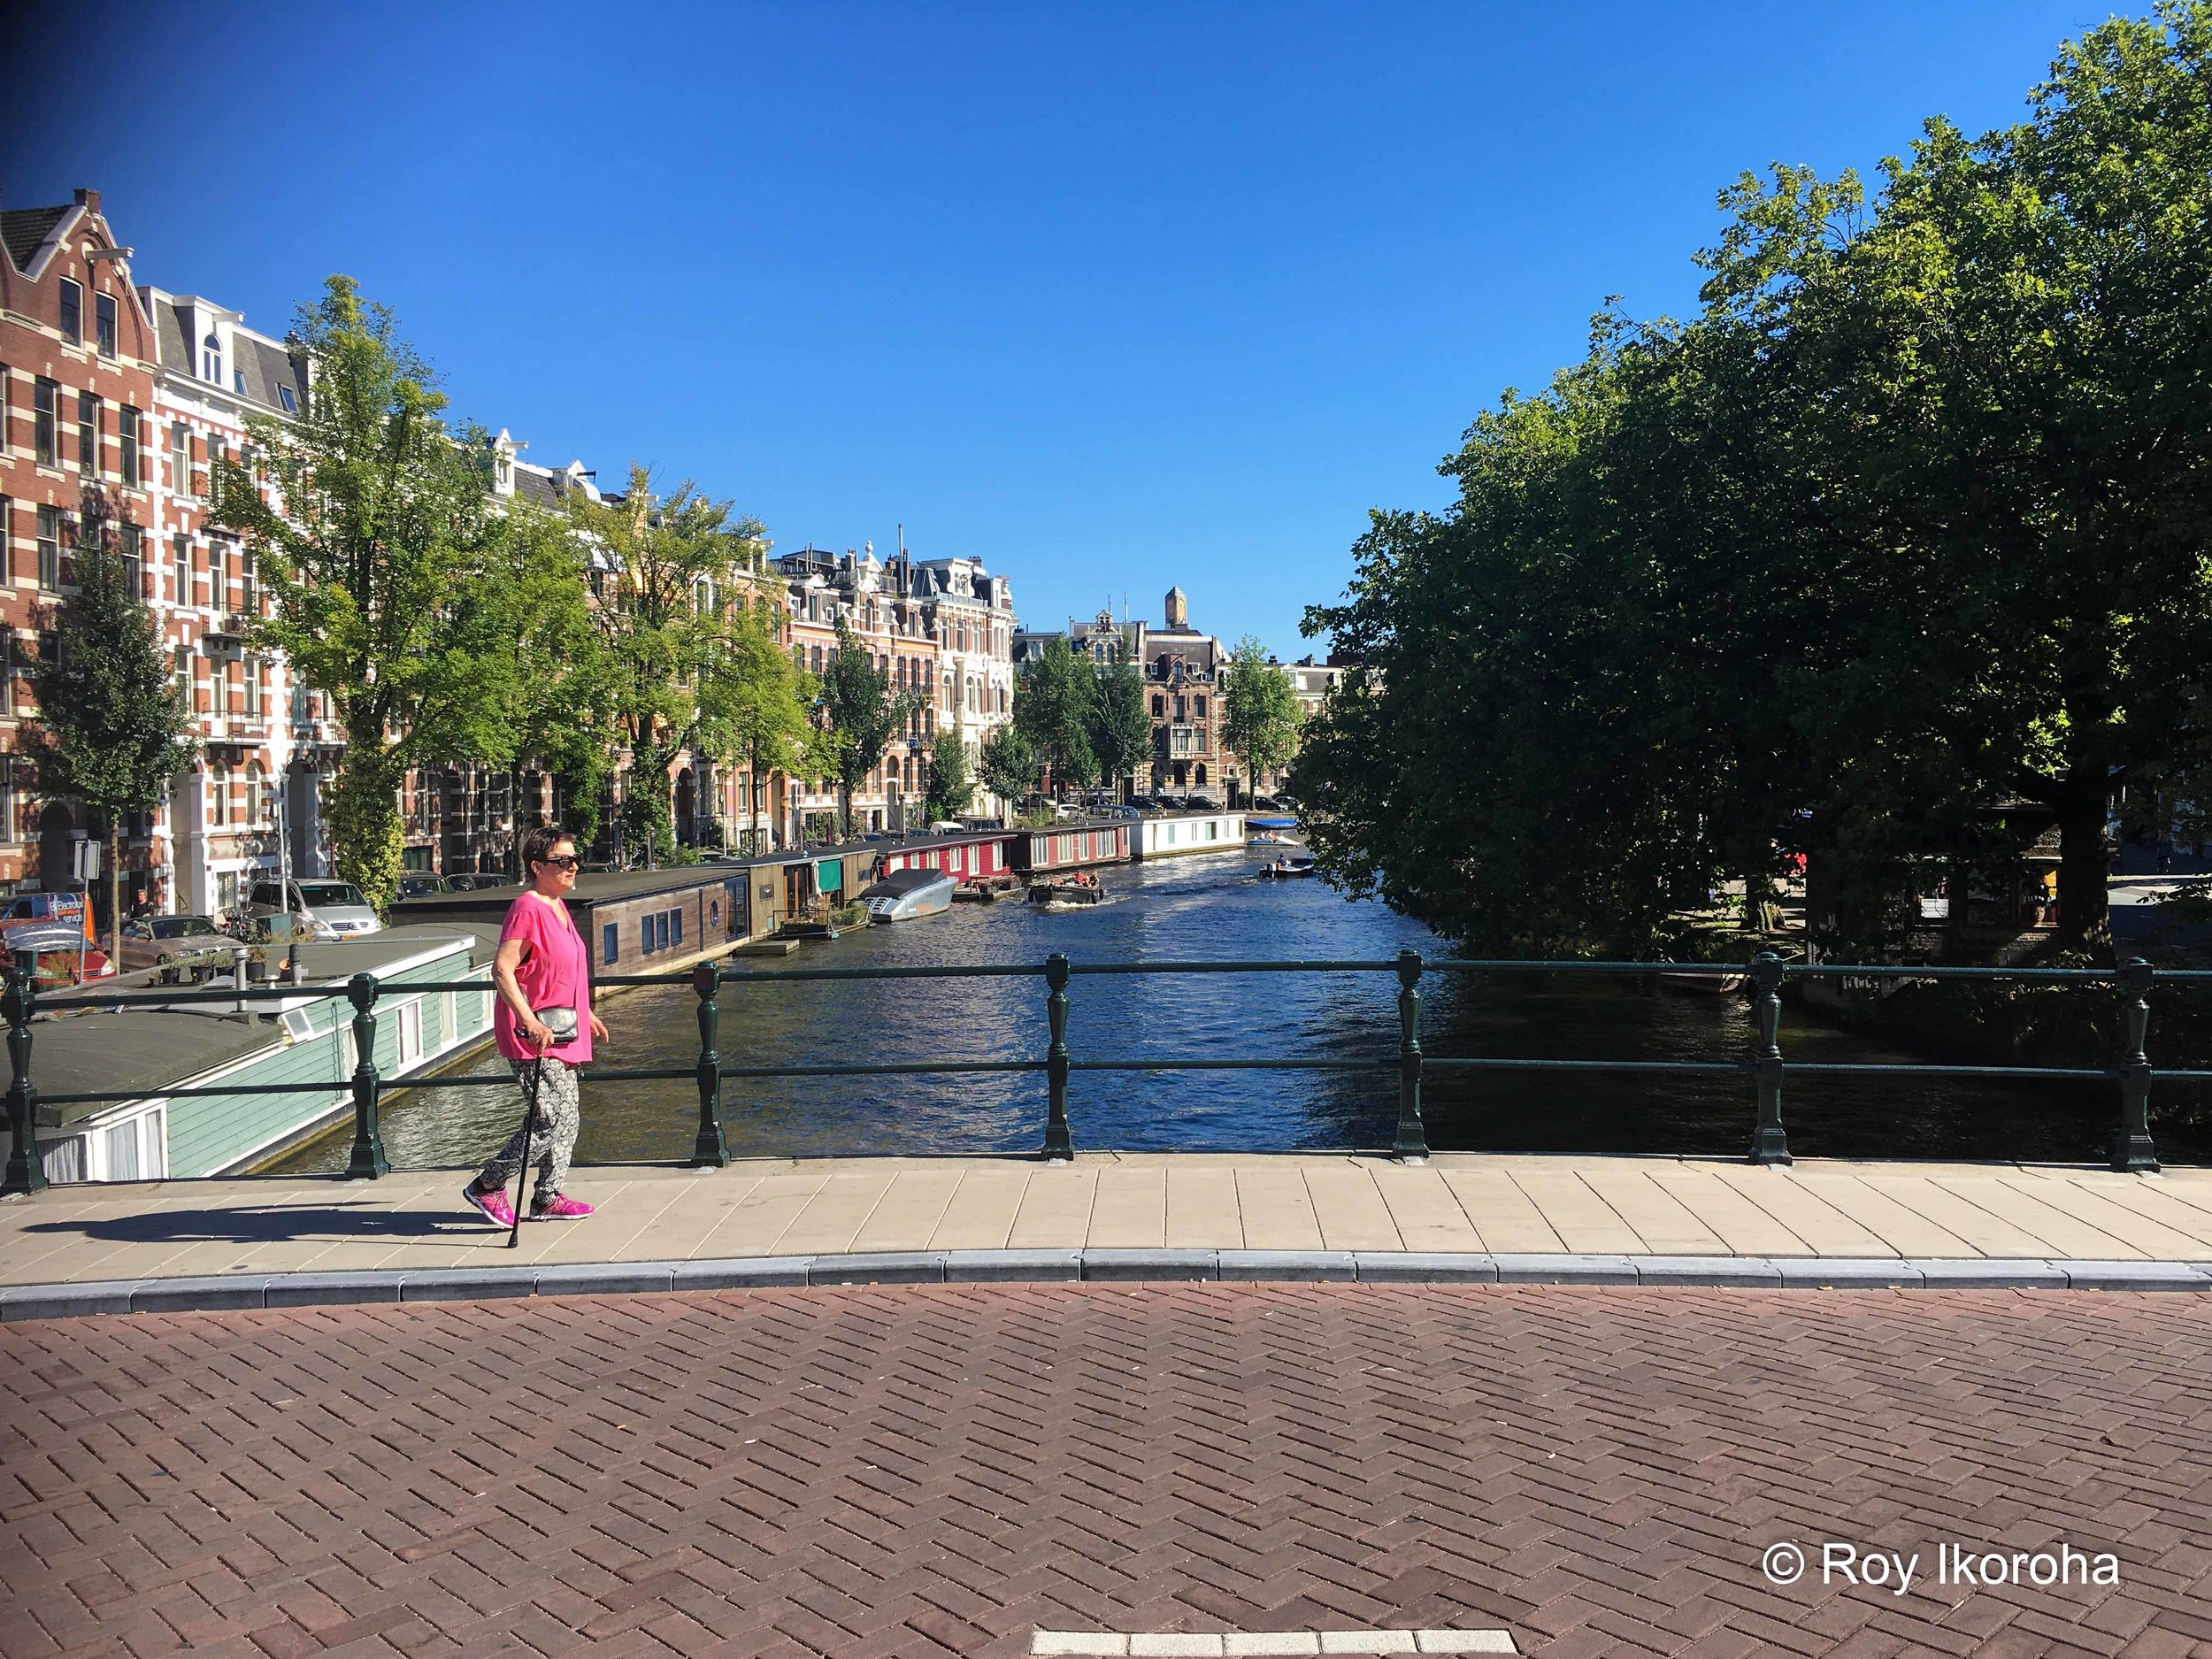 Bridge scenery, Amsterdam, Netherlands